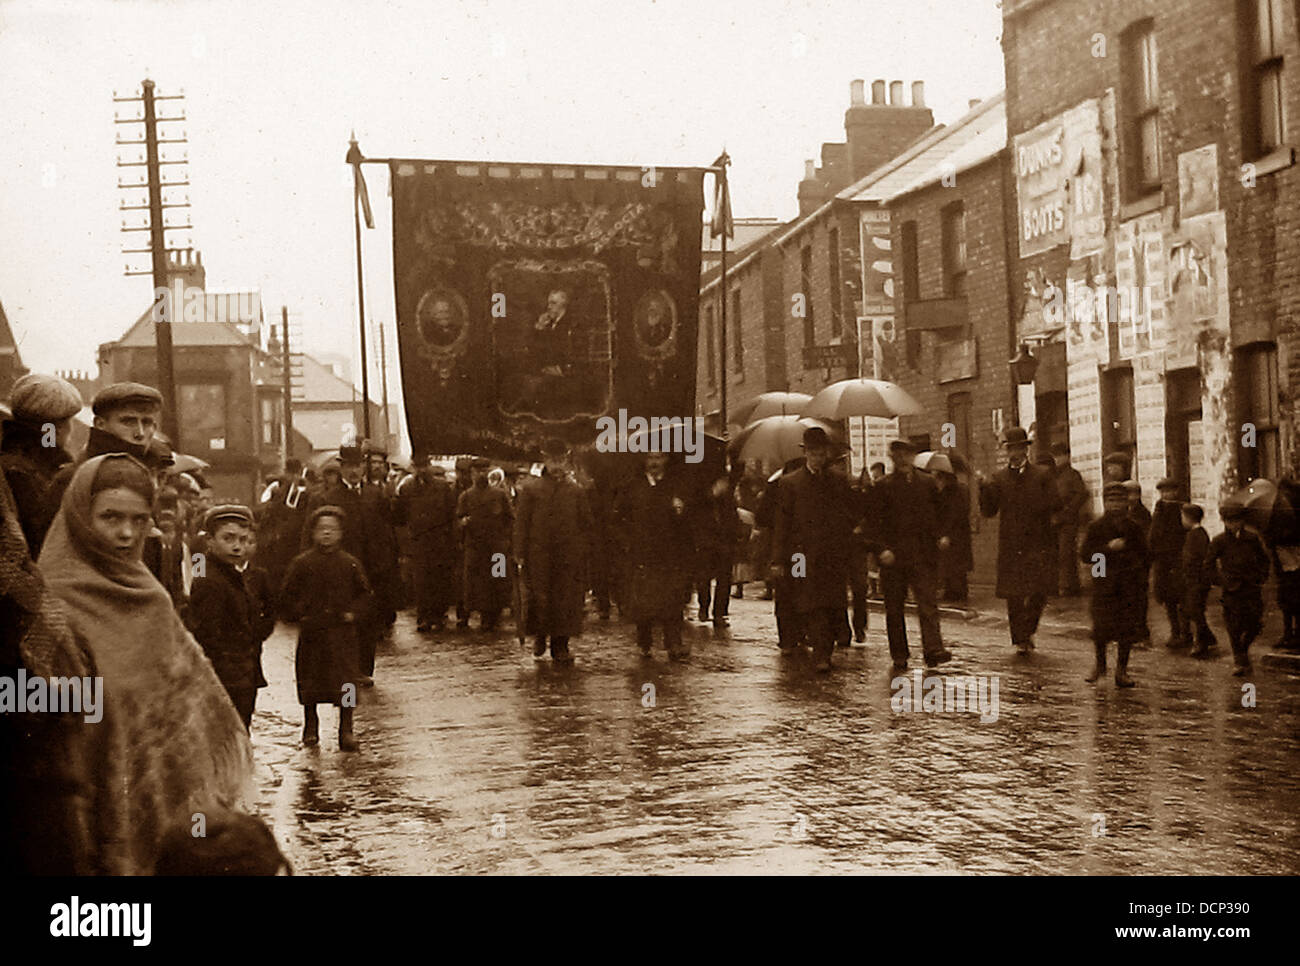 Miners' Gala Parade early 1900s Stock Photo